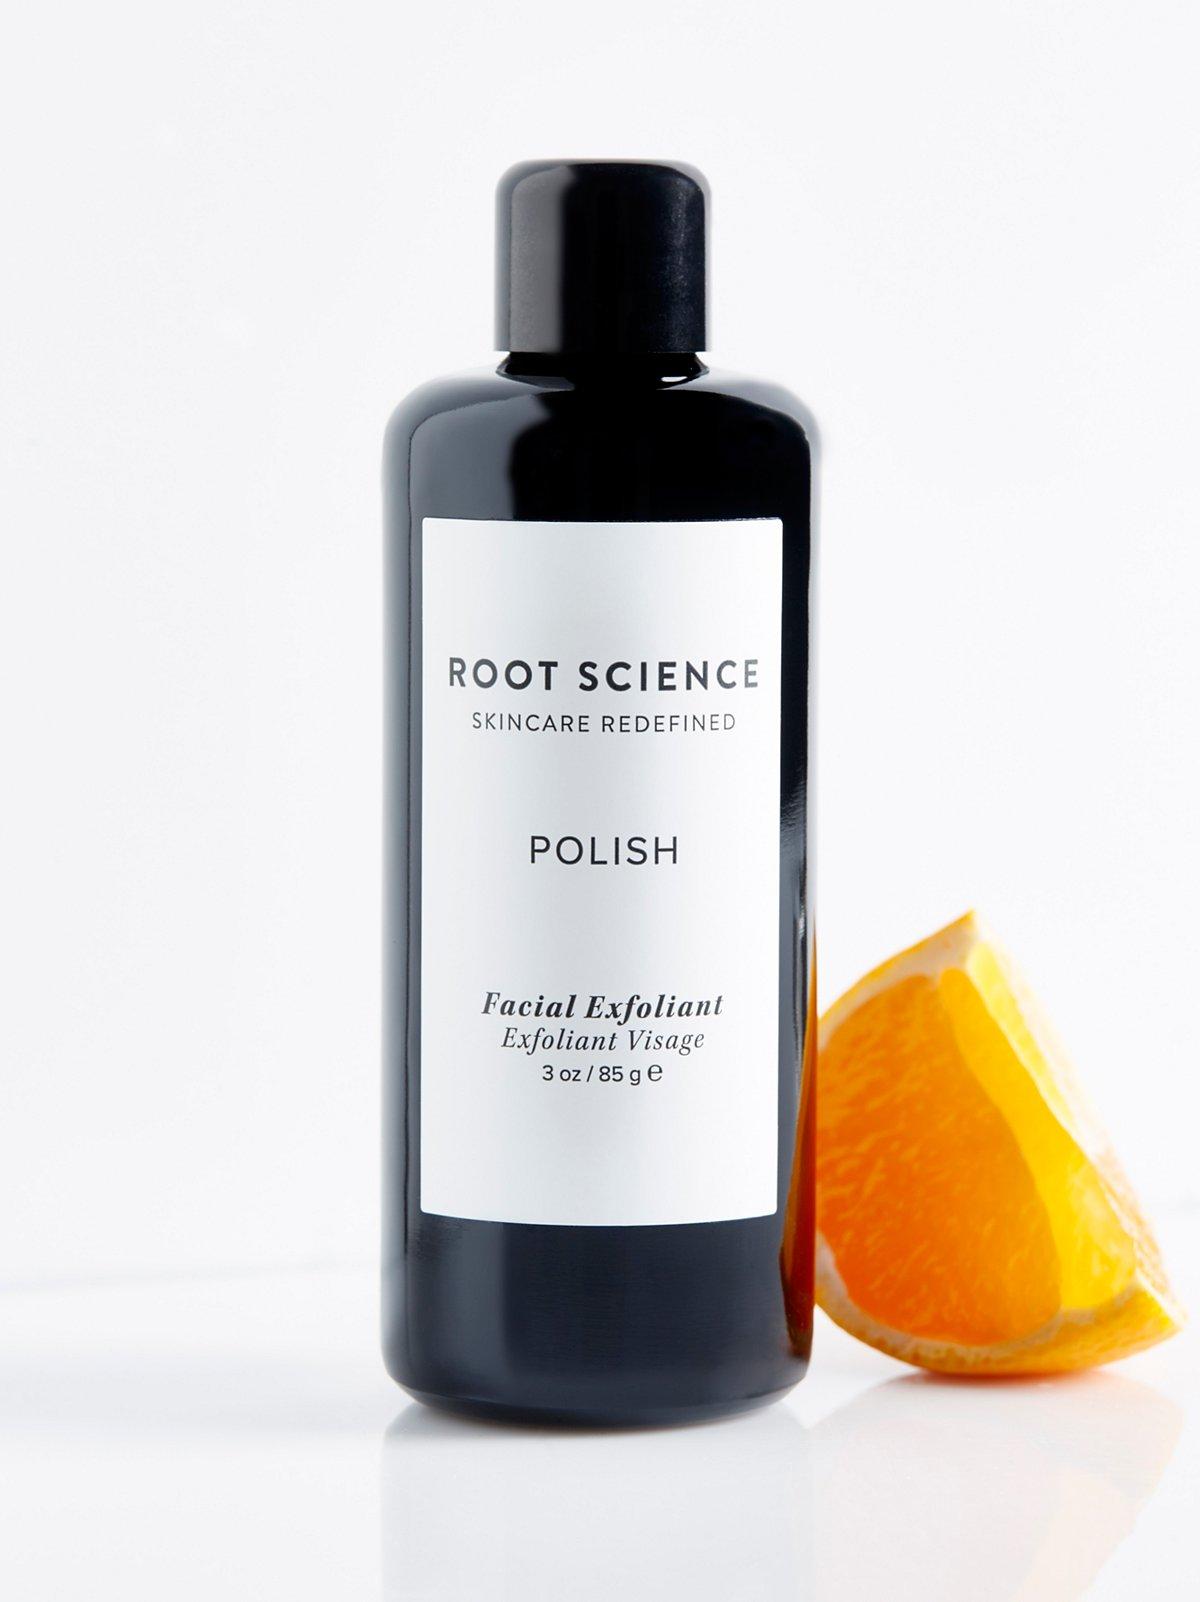 Polish Facial Exfoliant